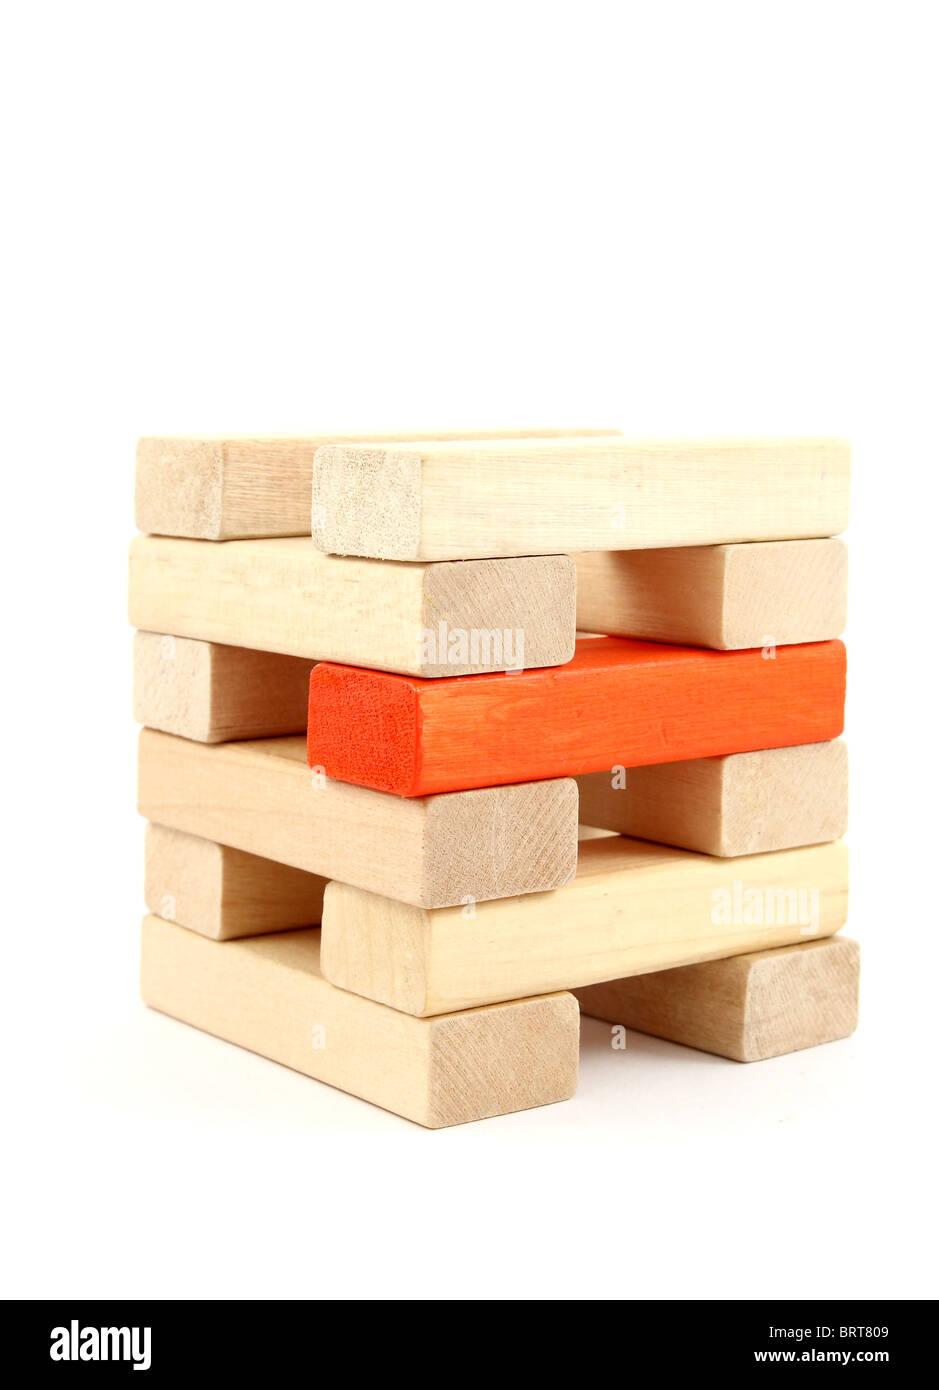 Toy wooden blocks - Stock Image